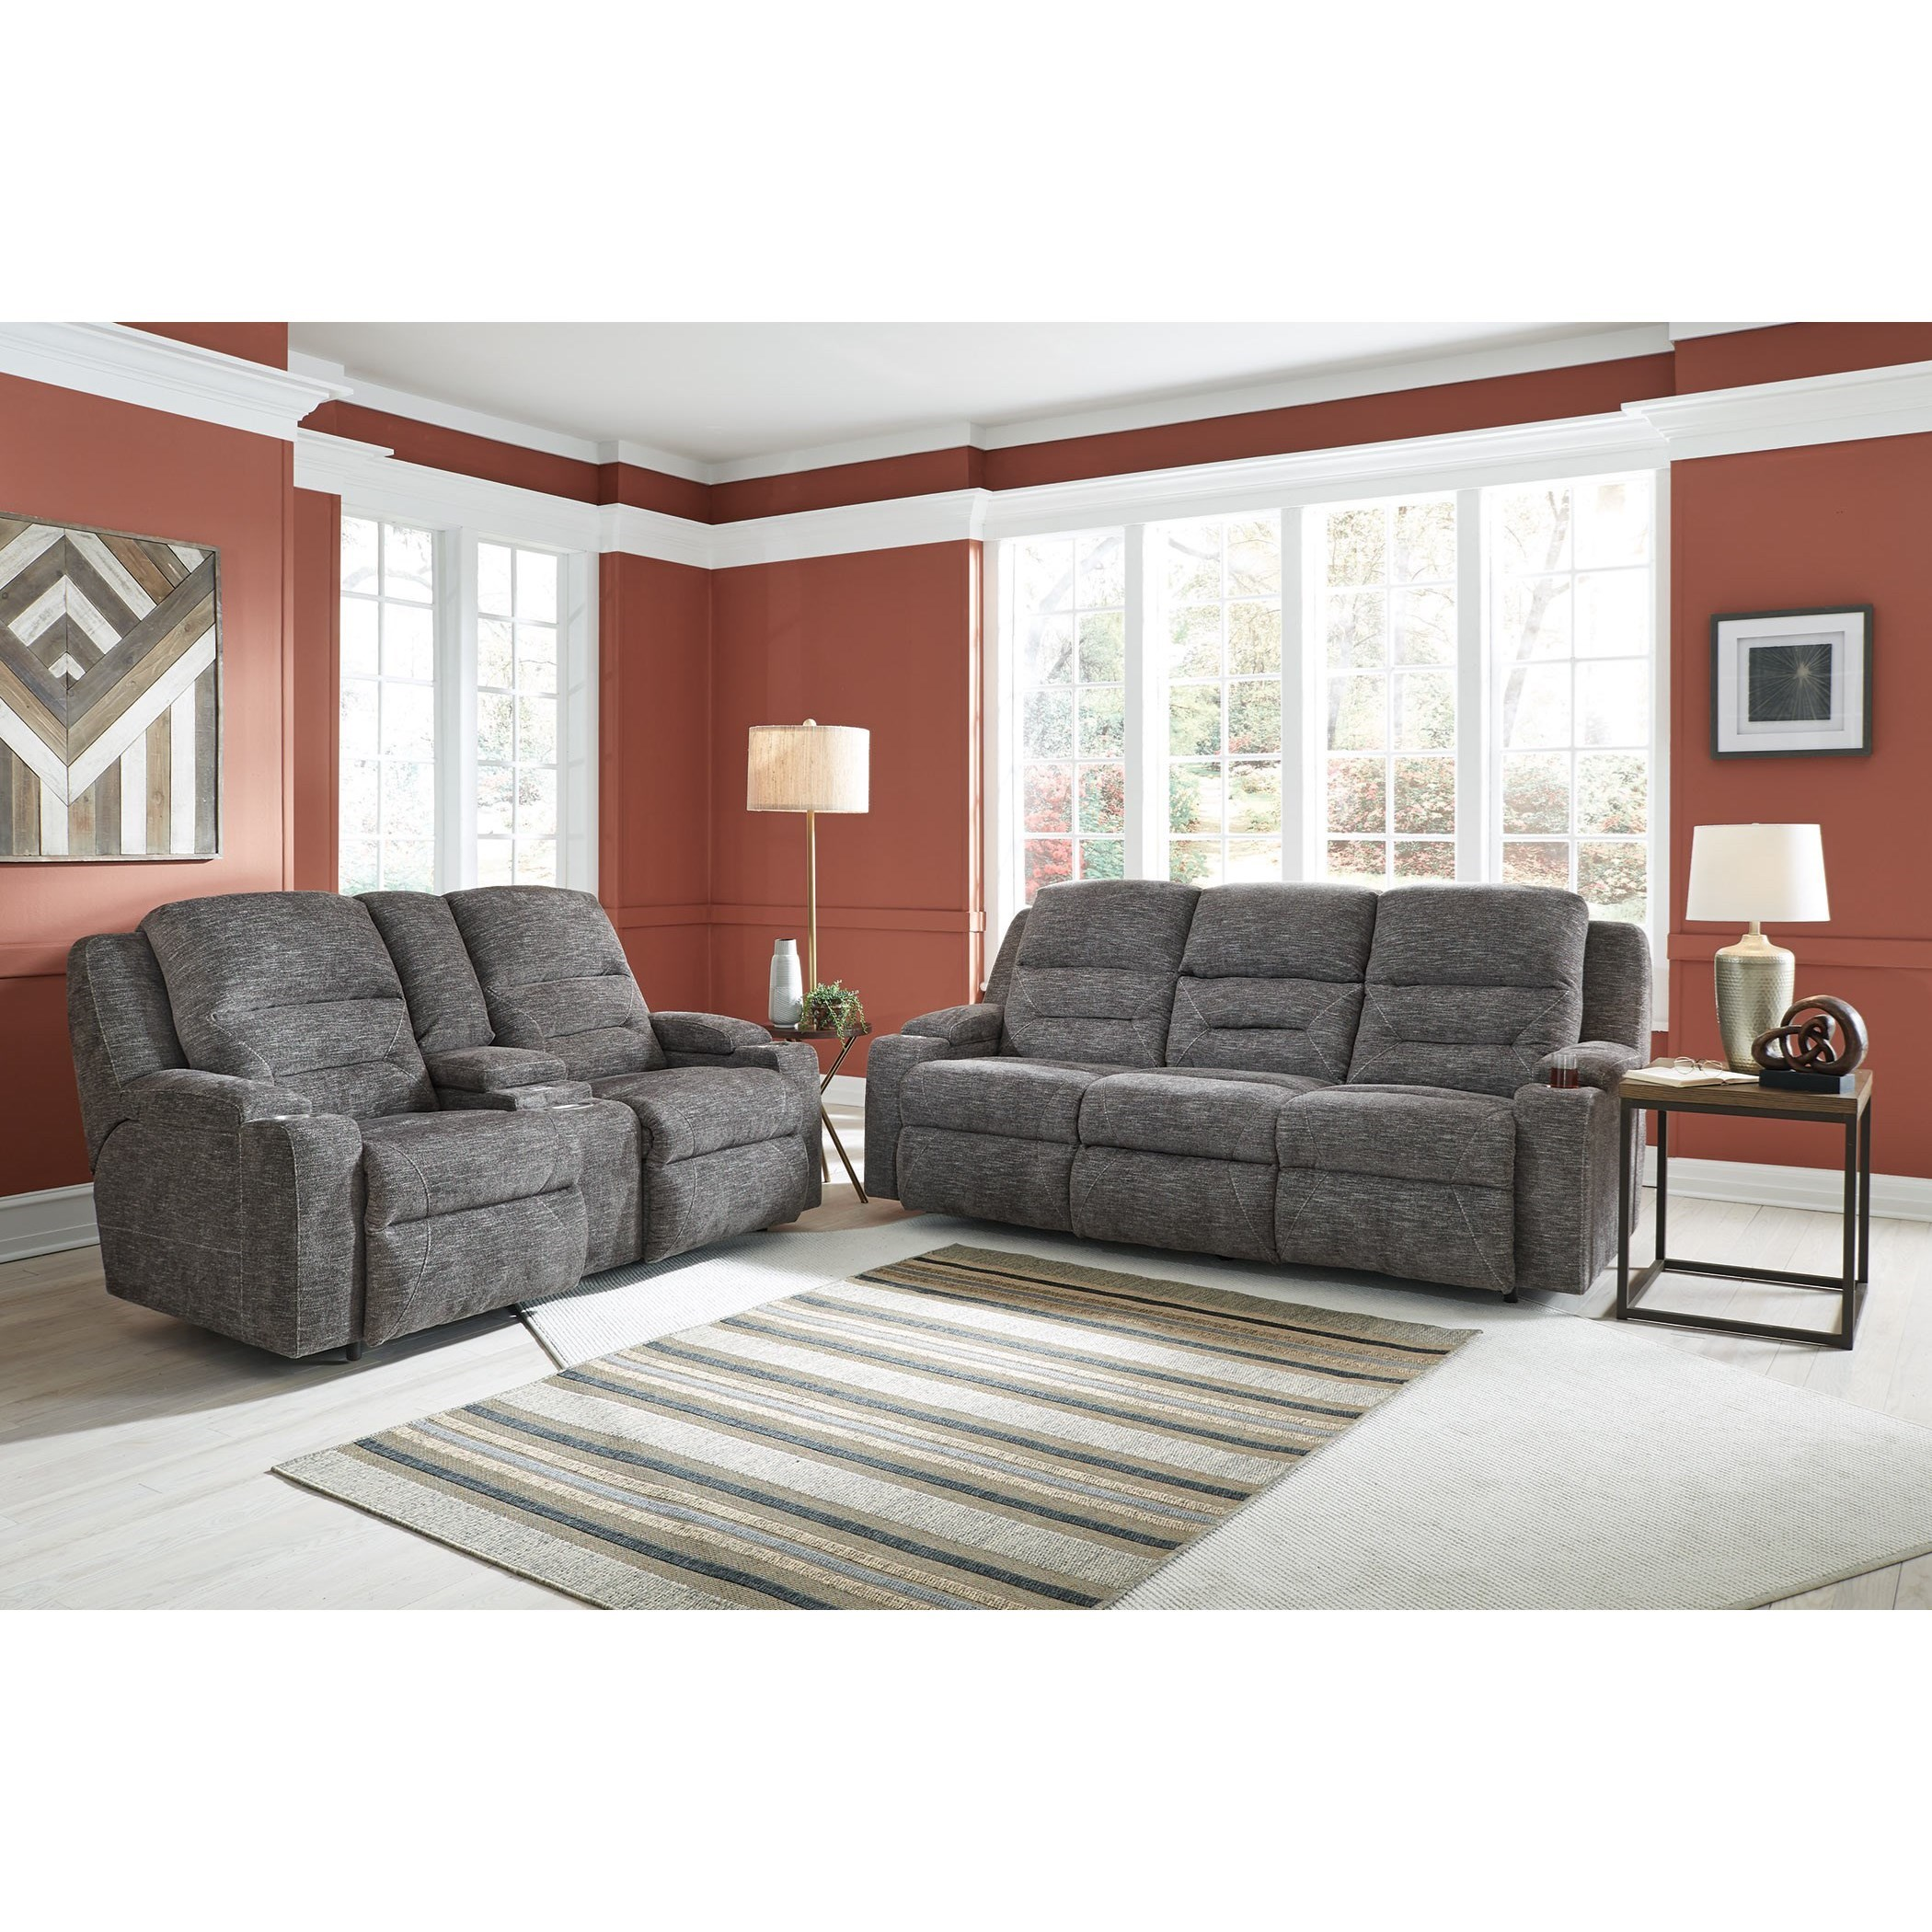 Franklin Beacon 79847 Power Reclining Sofa With Fold Down